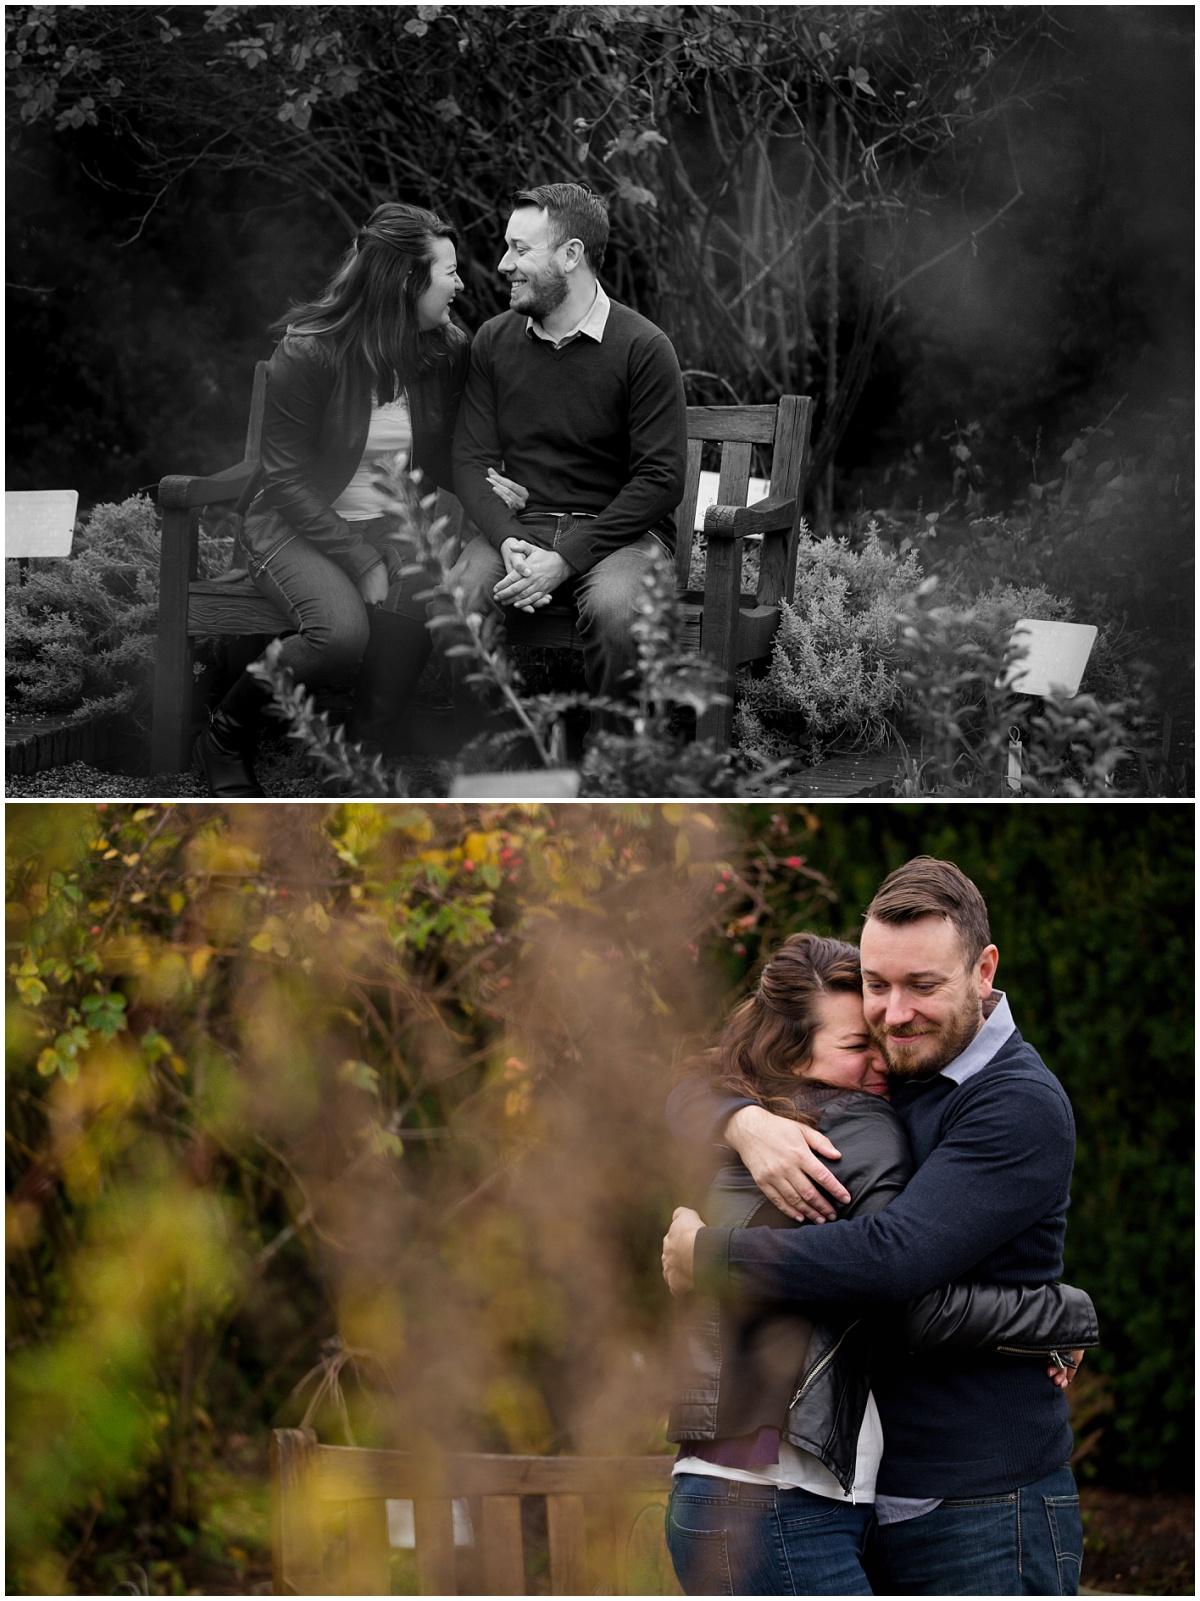 Amazing Day Photography - Langley Wedding Photographer - UBC Engagement Session - Gastown Engagement Session - Pub Engagement Session - Vancouver Photographer (7).jpg